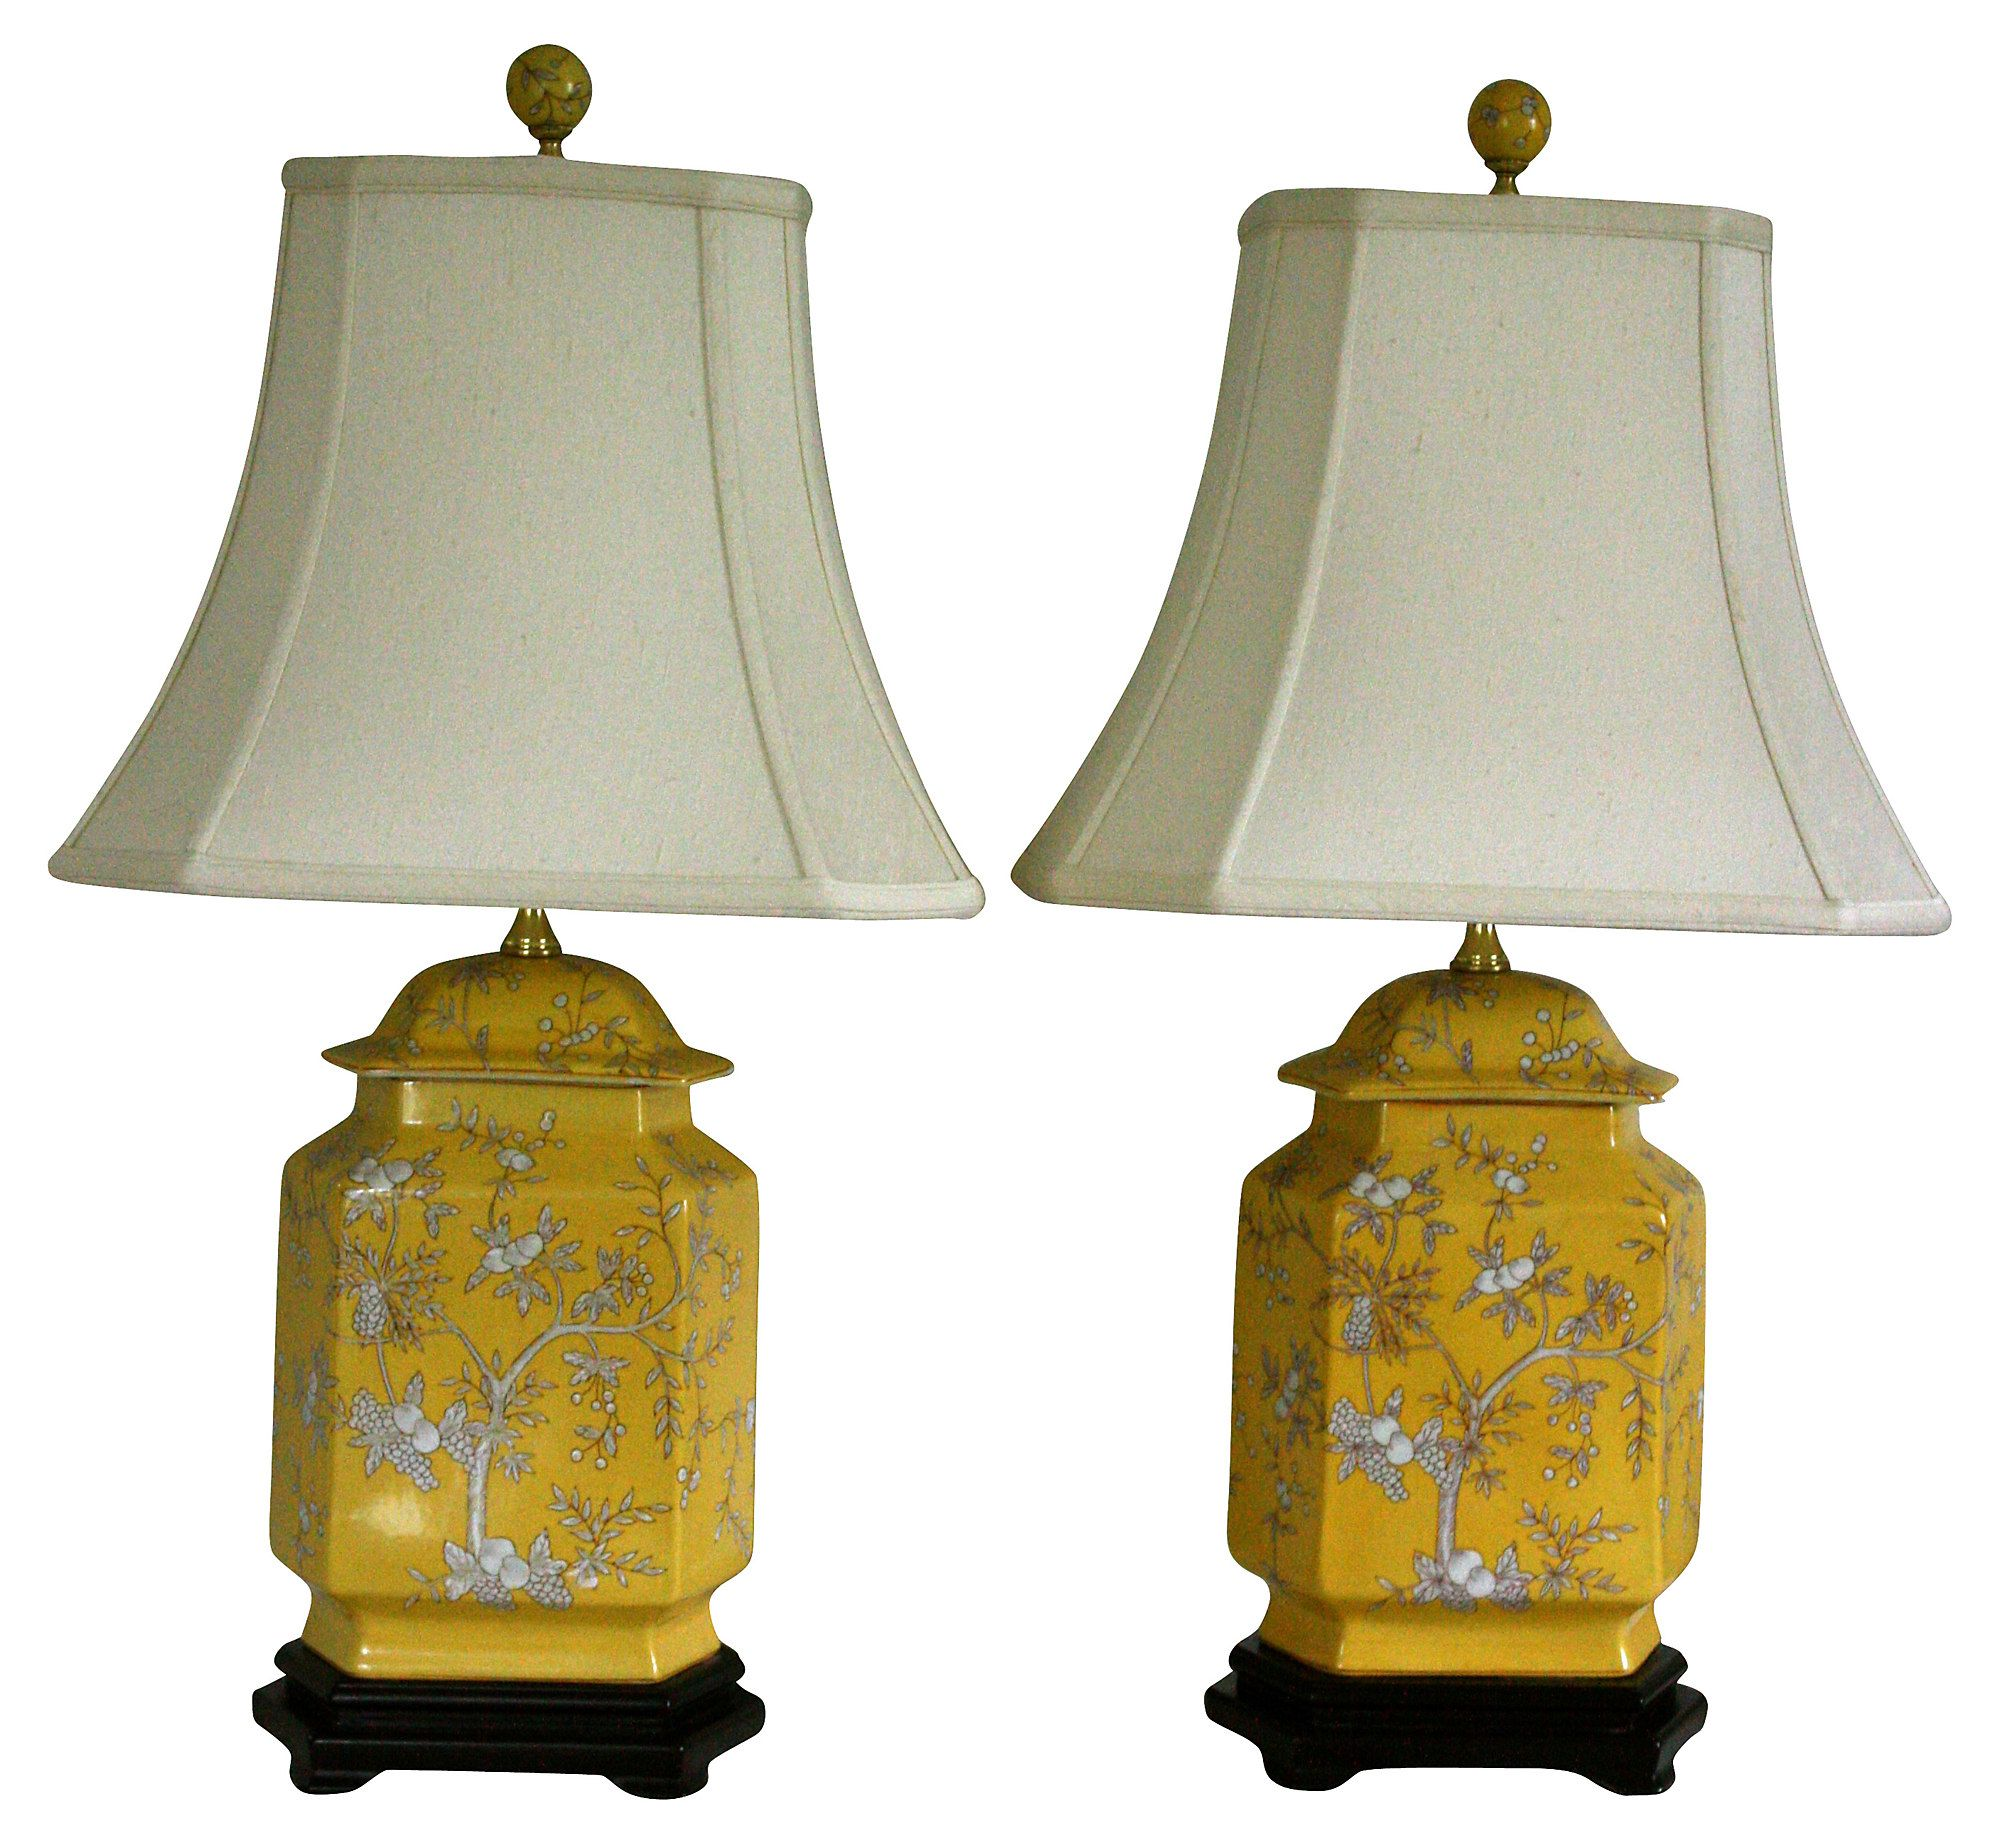 Yellow chinoiserie lamps pair one kings lane chinoiserie yellow chinoiserie lamps pair one kings lane arubaitofo Choice Image